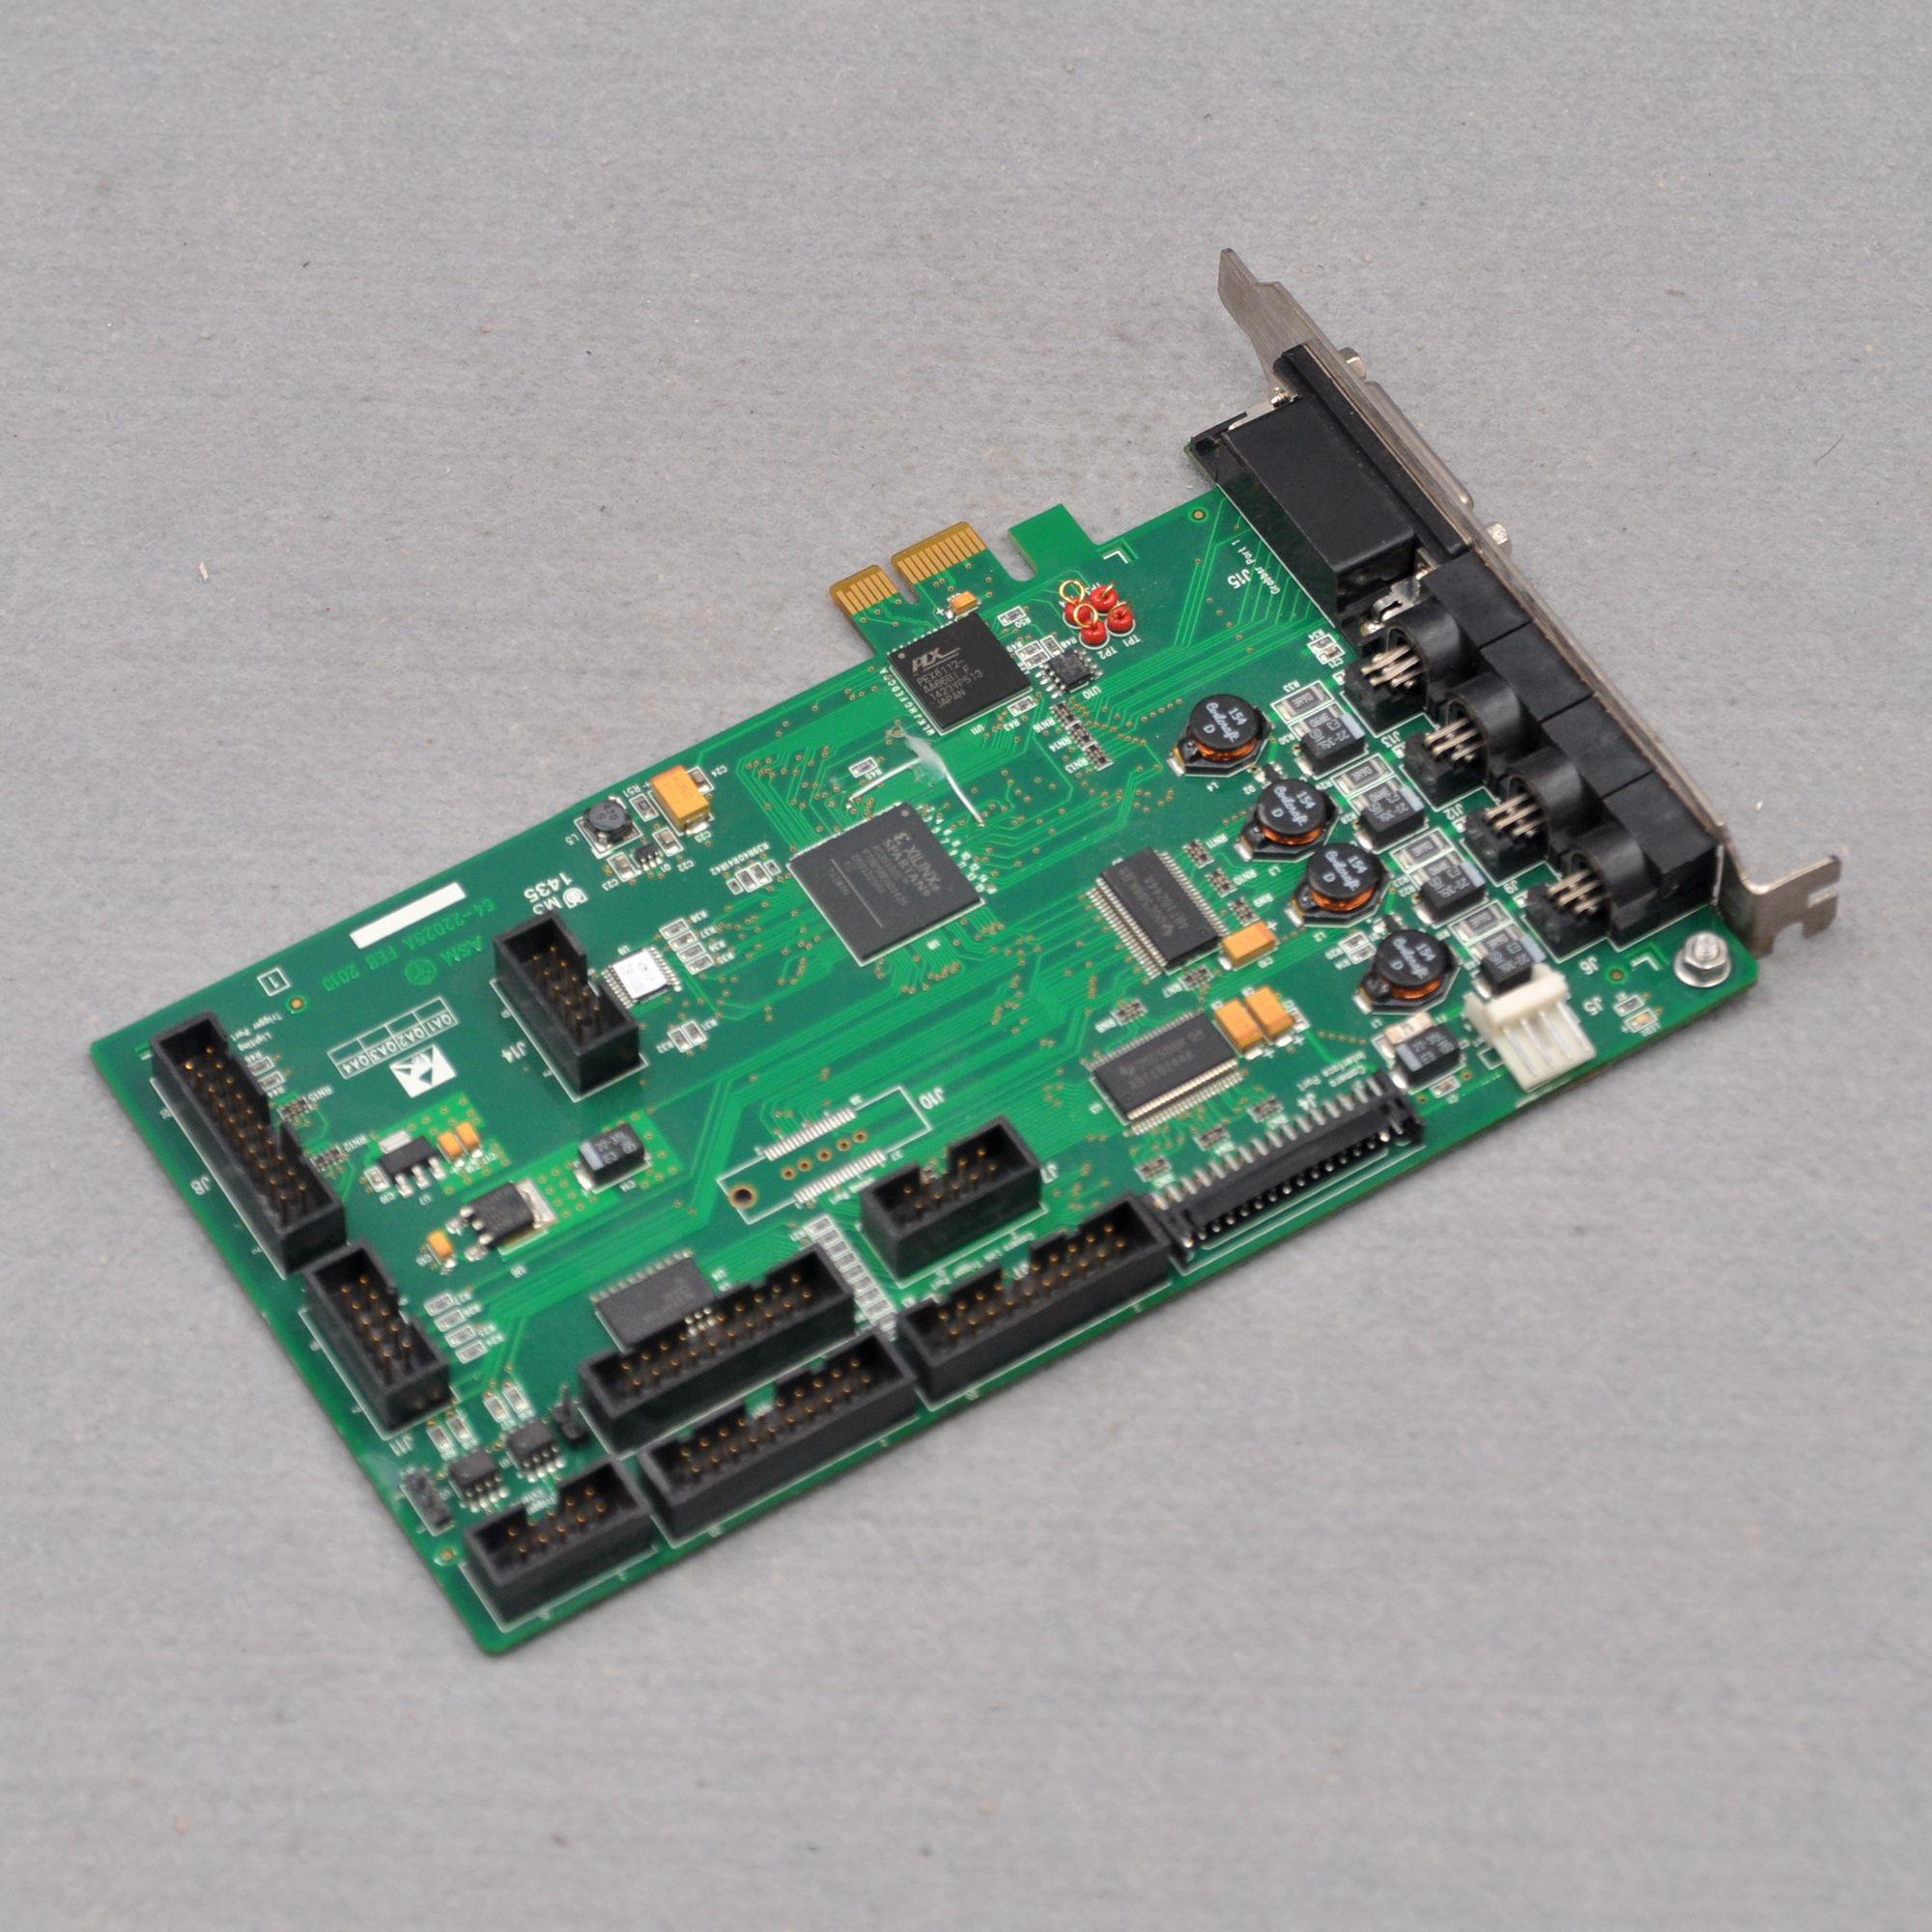 ASM 64-22025A FEB 2010 Industrial Capture Card PCI Card enlarge